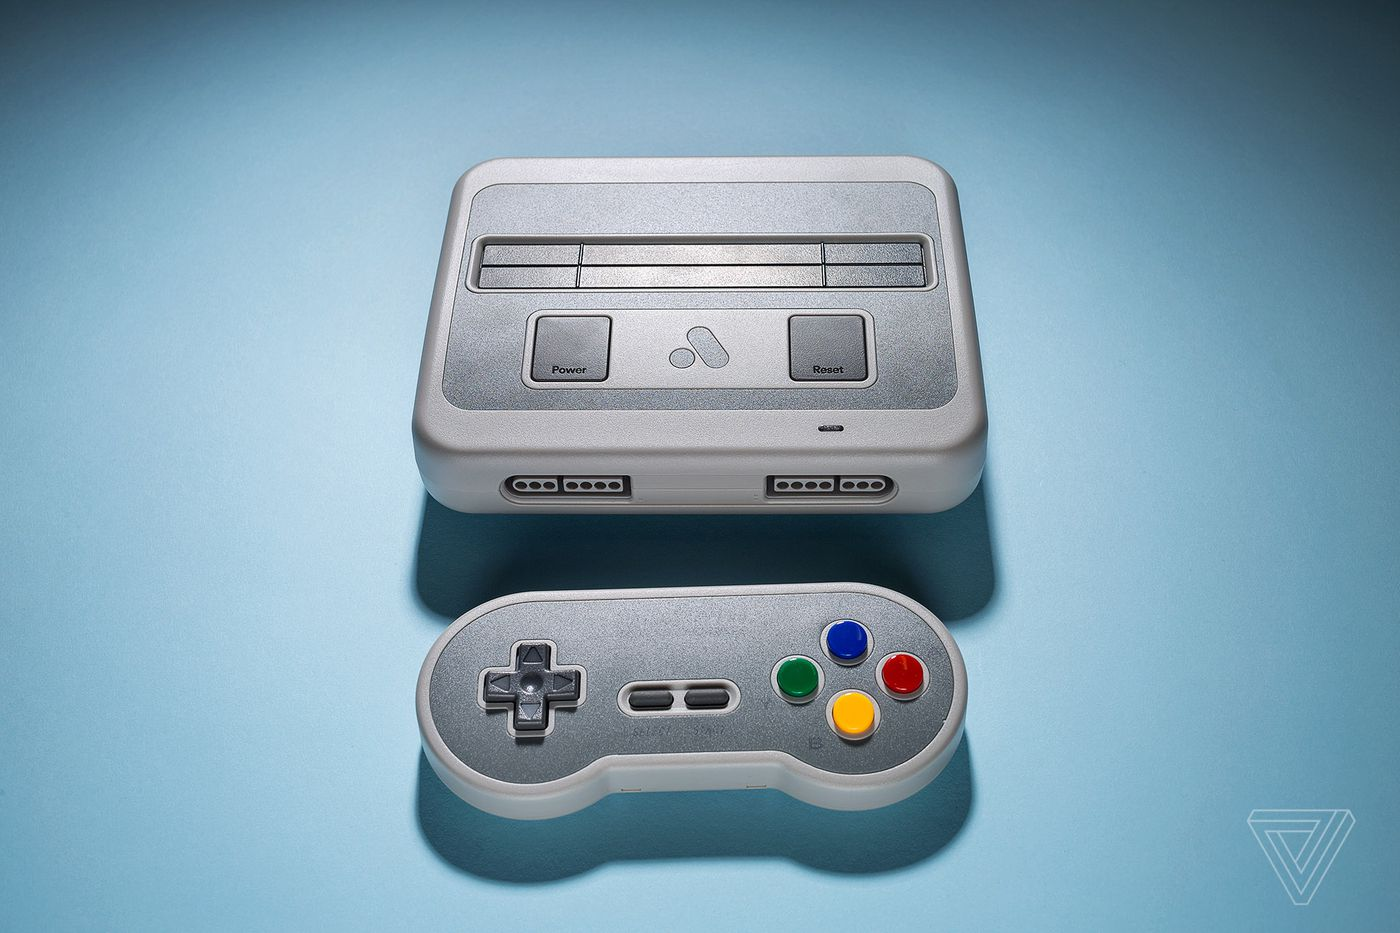 Analogue Super Nt review: a sleek way to play original SNES games